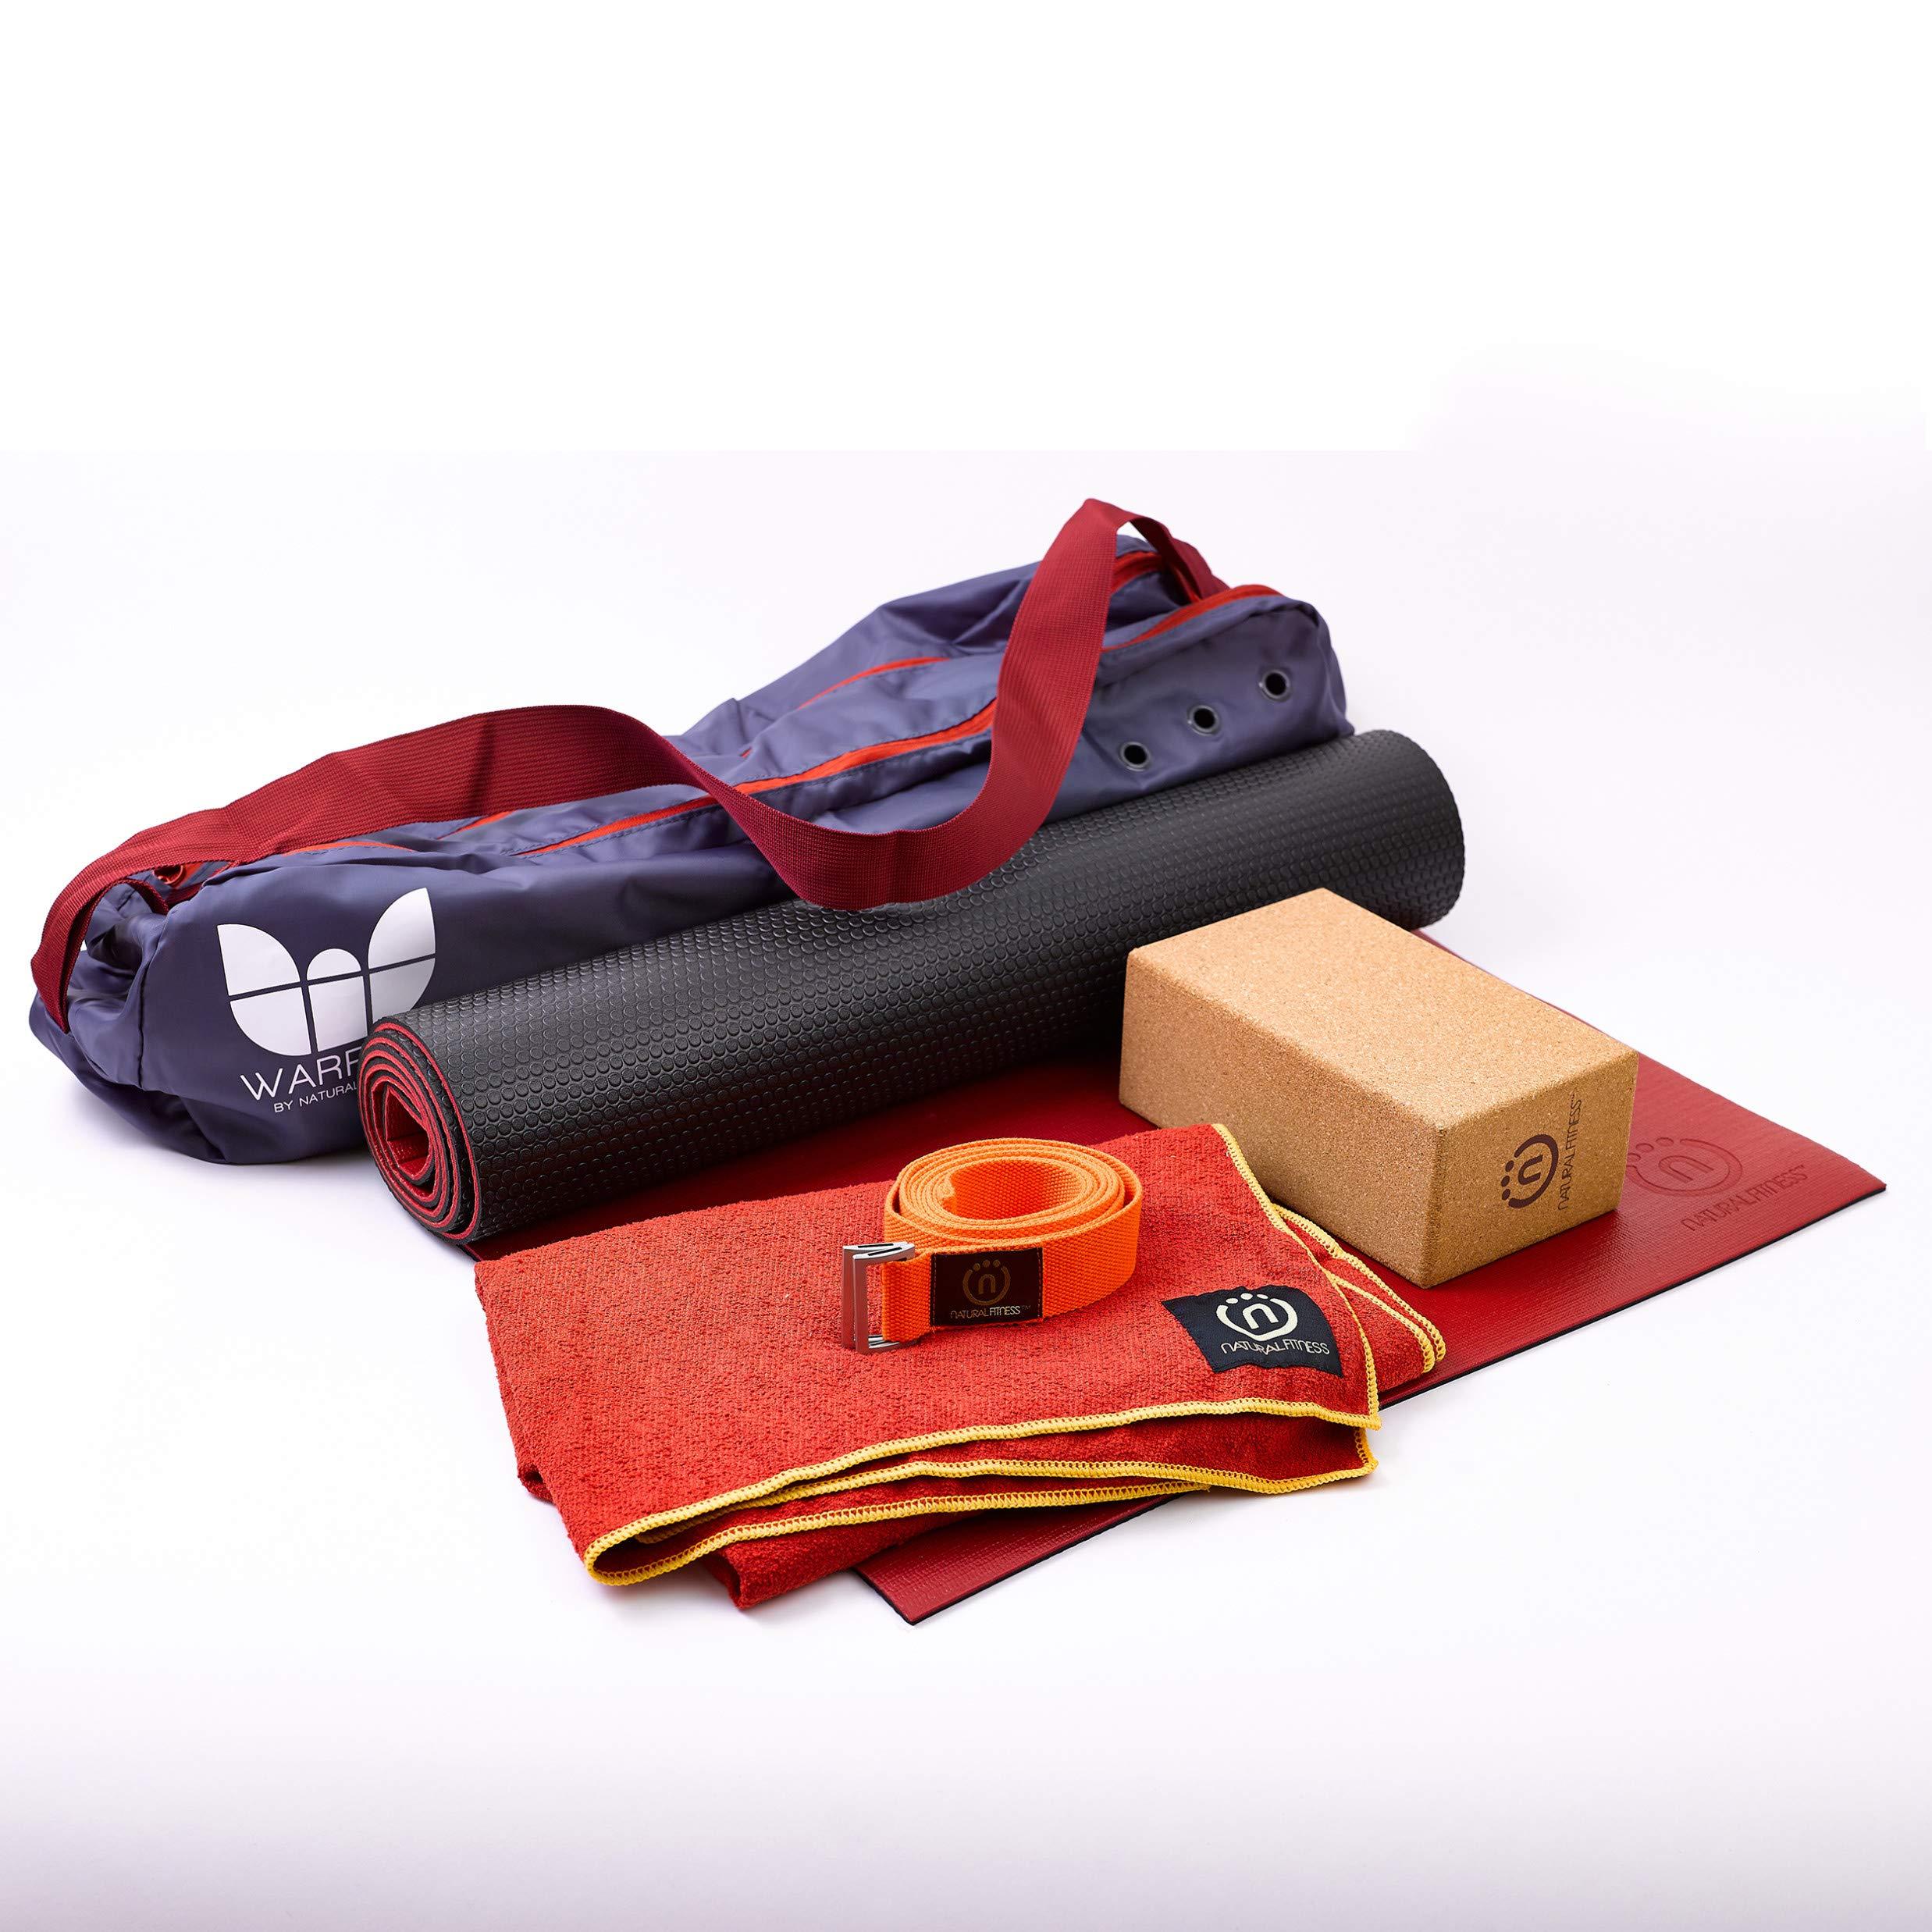 Natural Fitness Hot Yoga Kit with Mat, Towel, Cork Block, Hemp Strap, and Bag